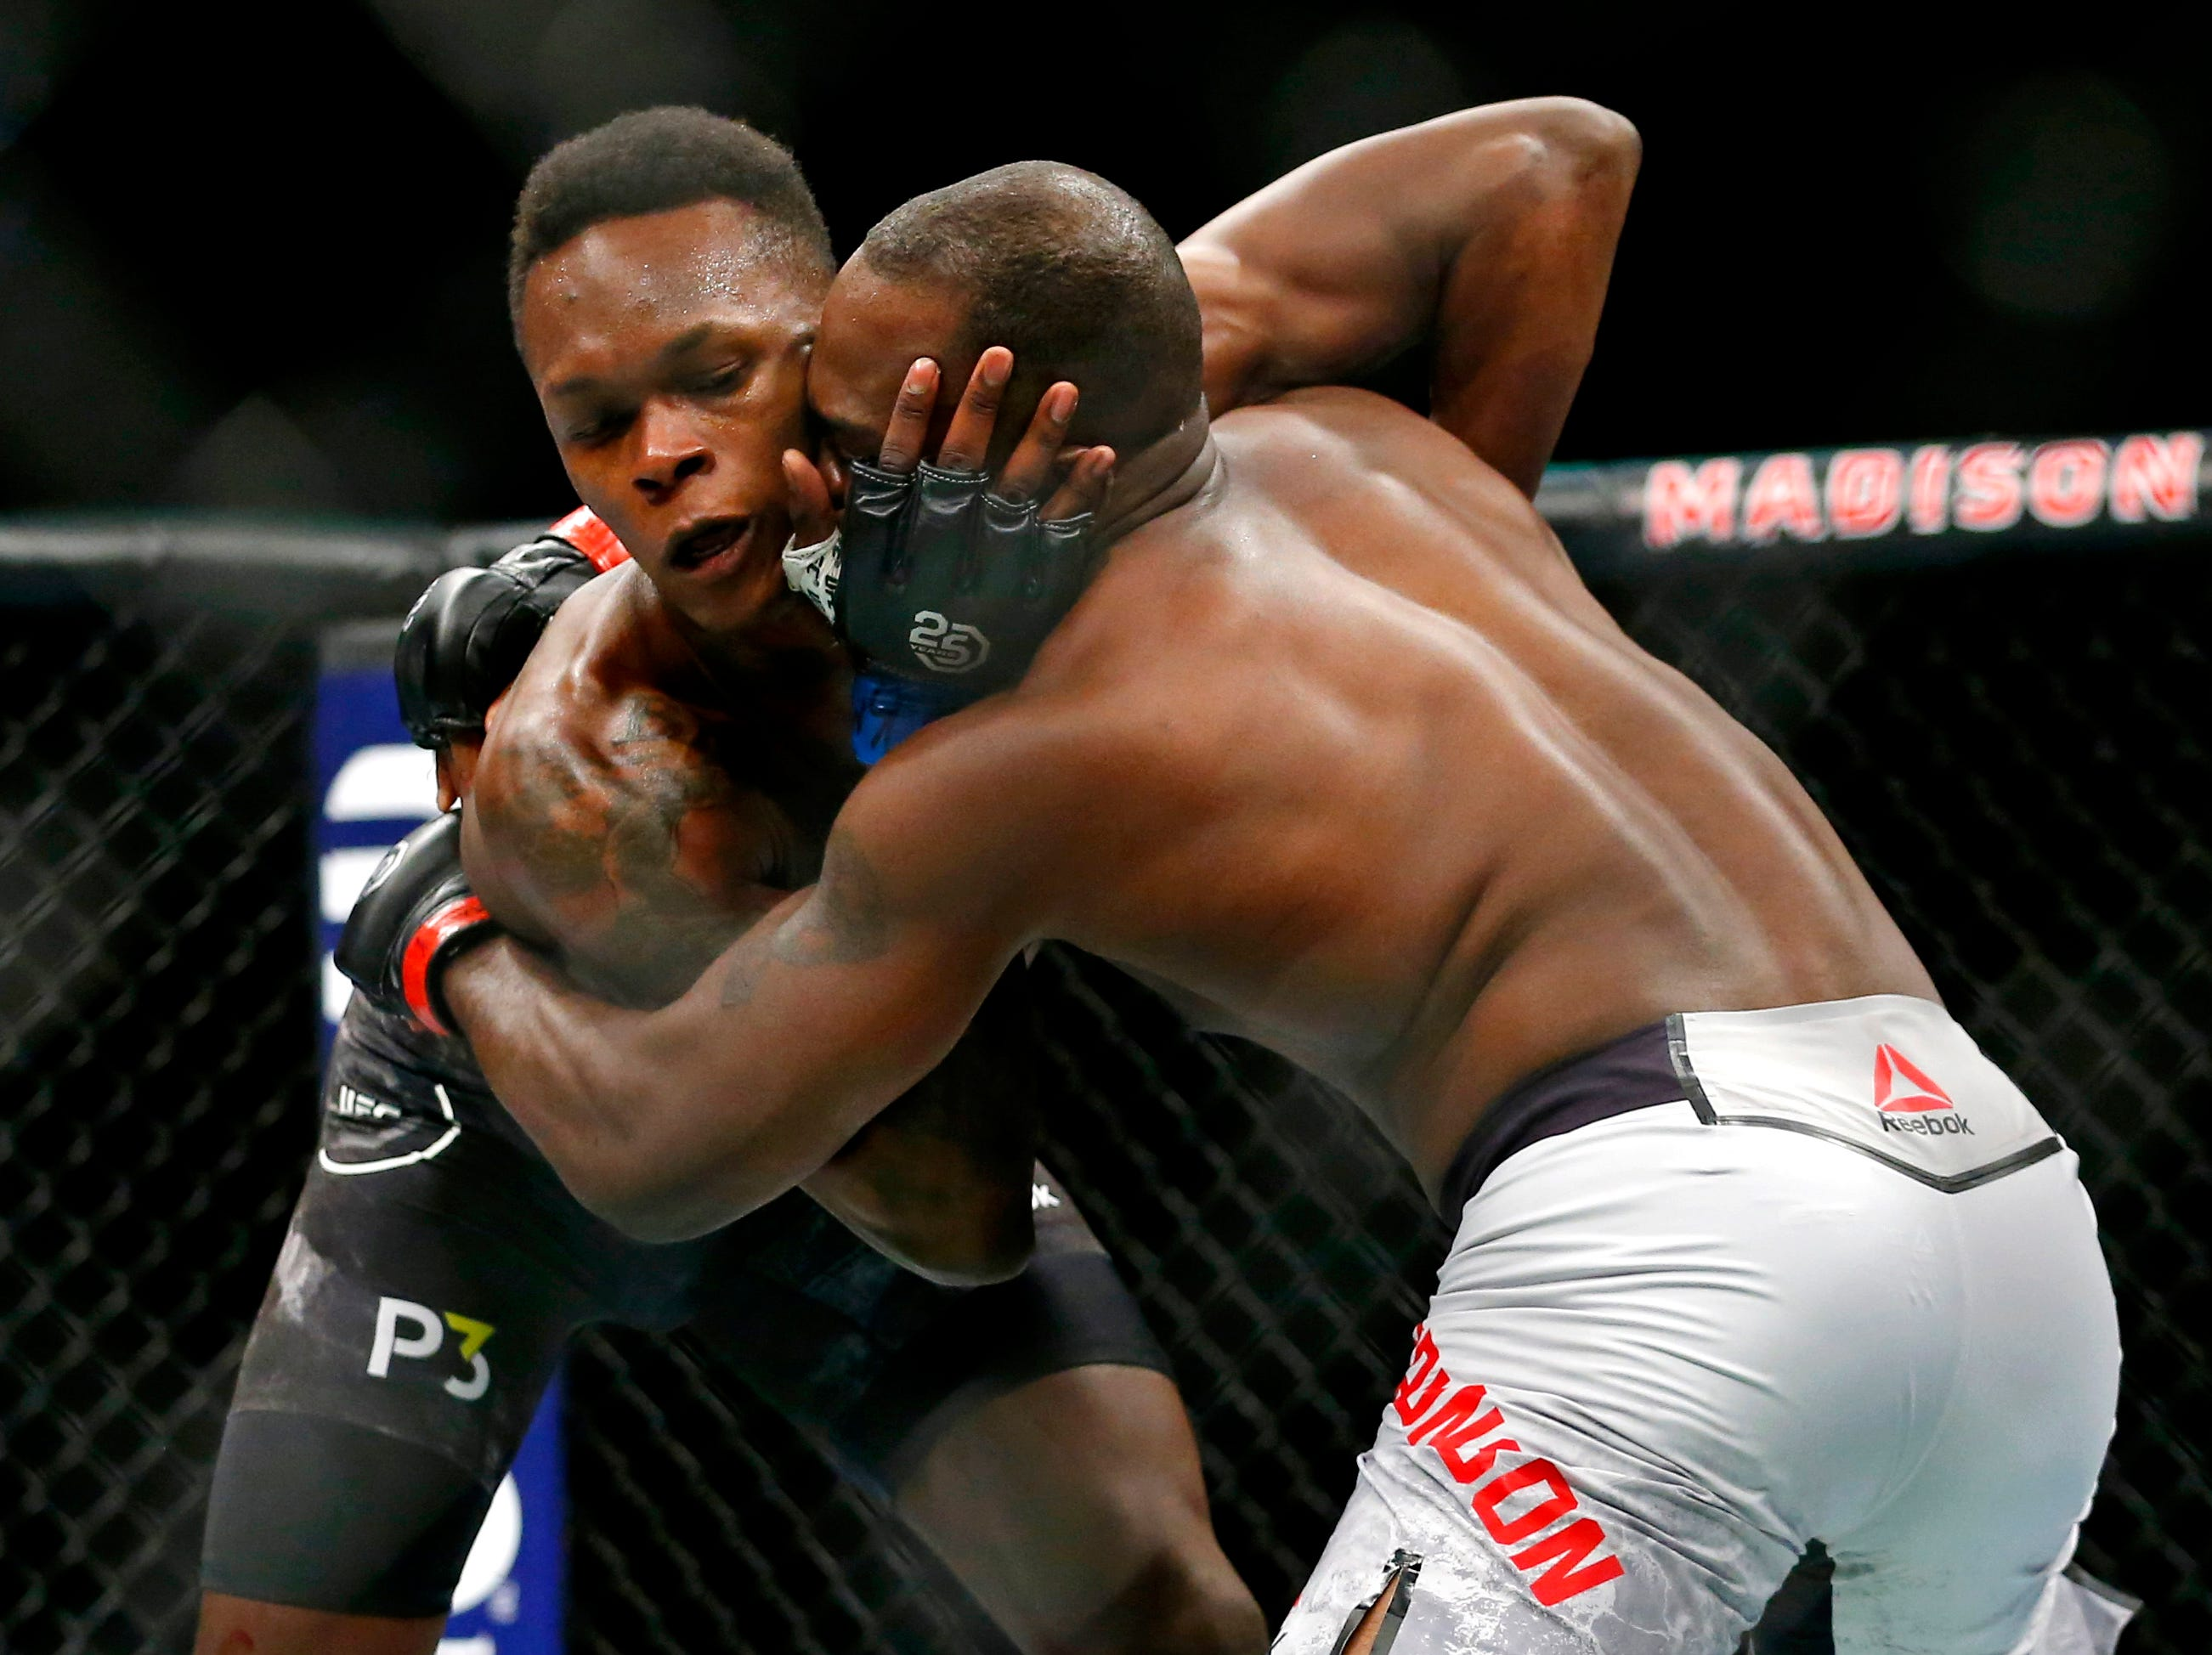 Derek Brunson (red gloves) fights Israel Adesanya (blue gloves) during UFC 230 at Madison Square Garden.